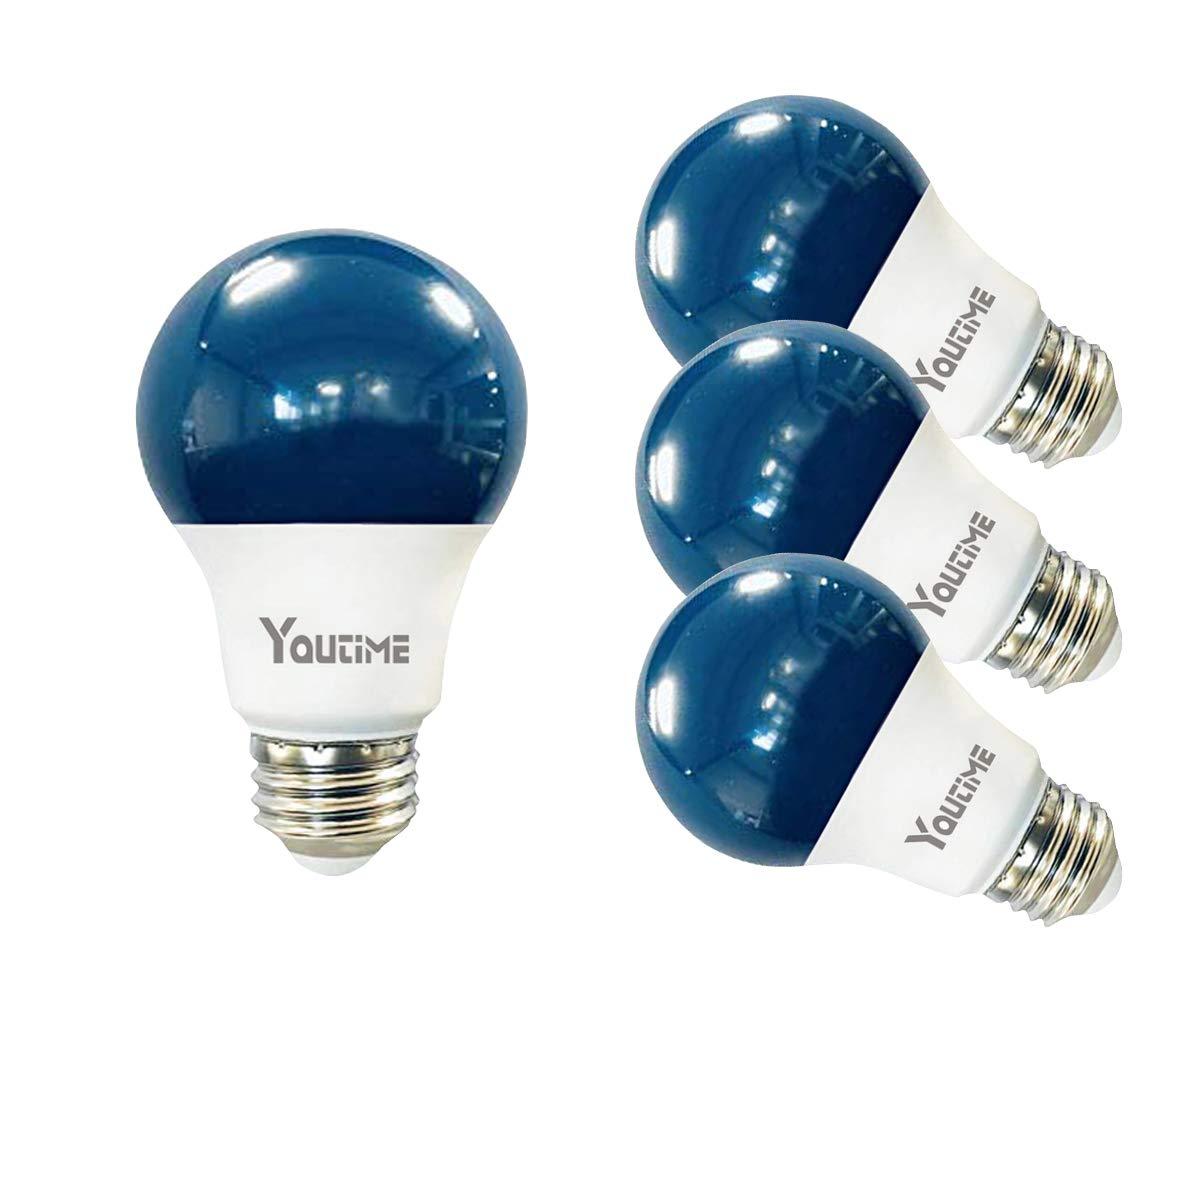 Youtime A19 LED Blue Bug Light Bulb 7W Daylight White 5000K with E26 Medium Base, 4 Packs